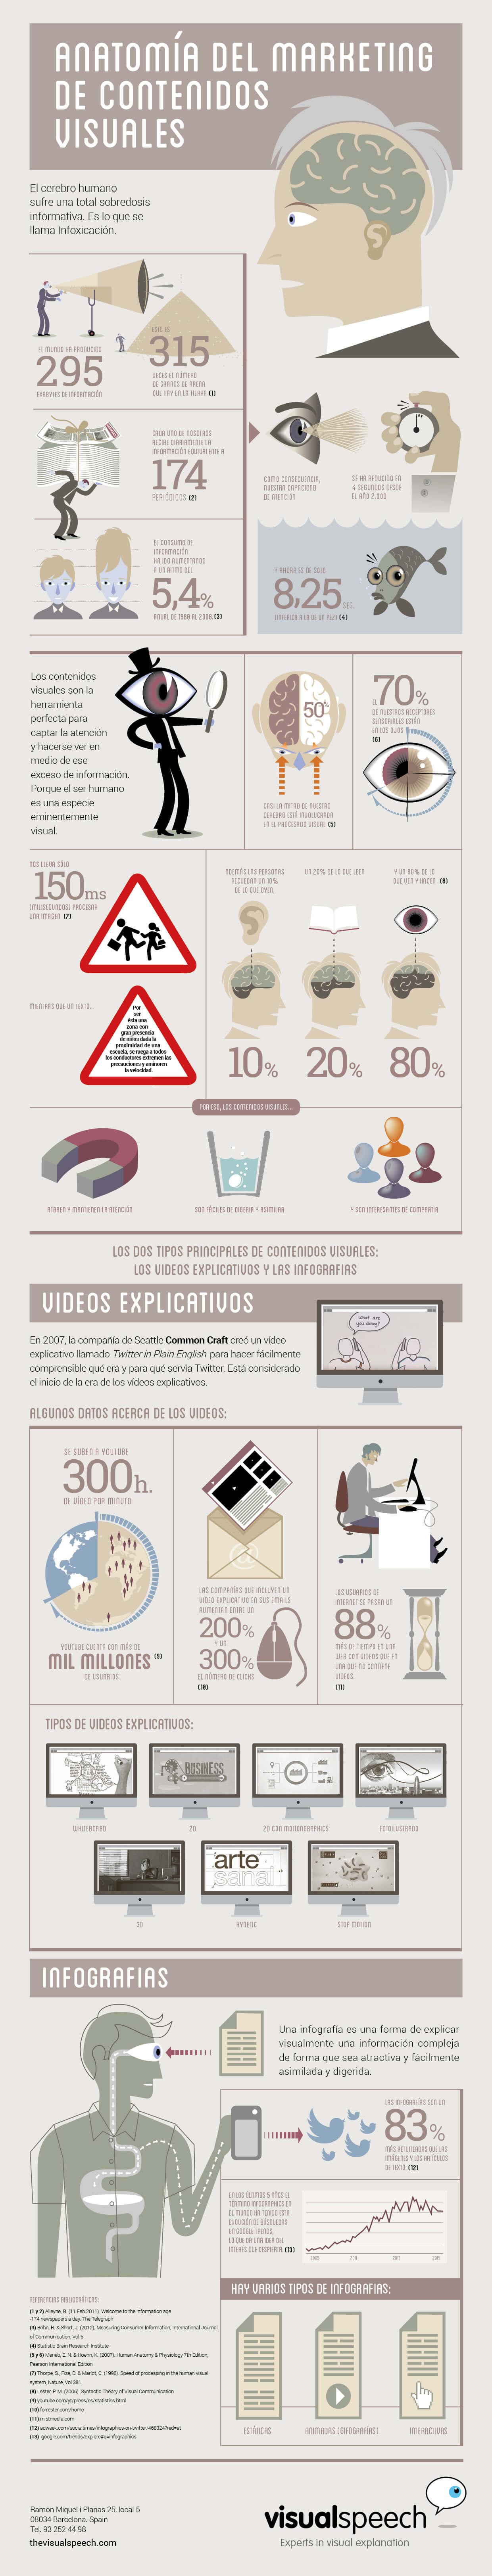 infografia visual speech